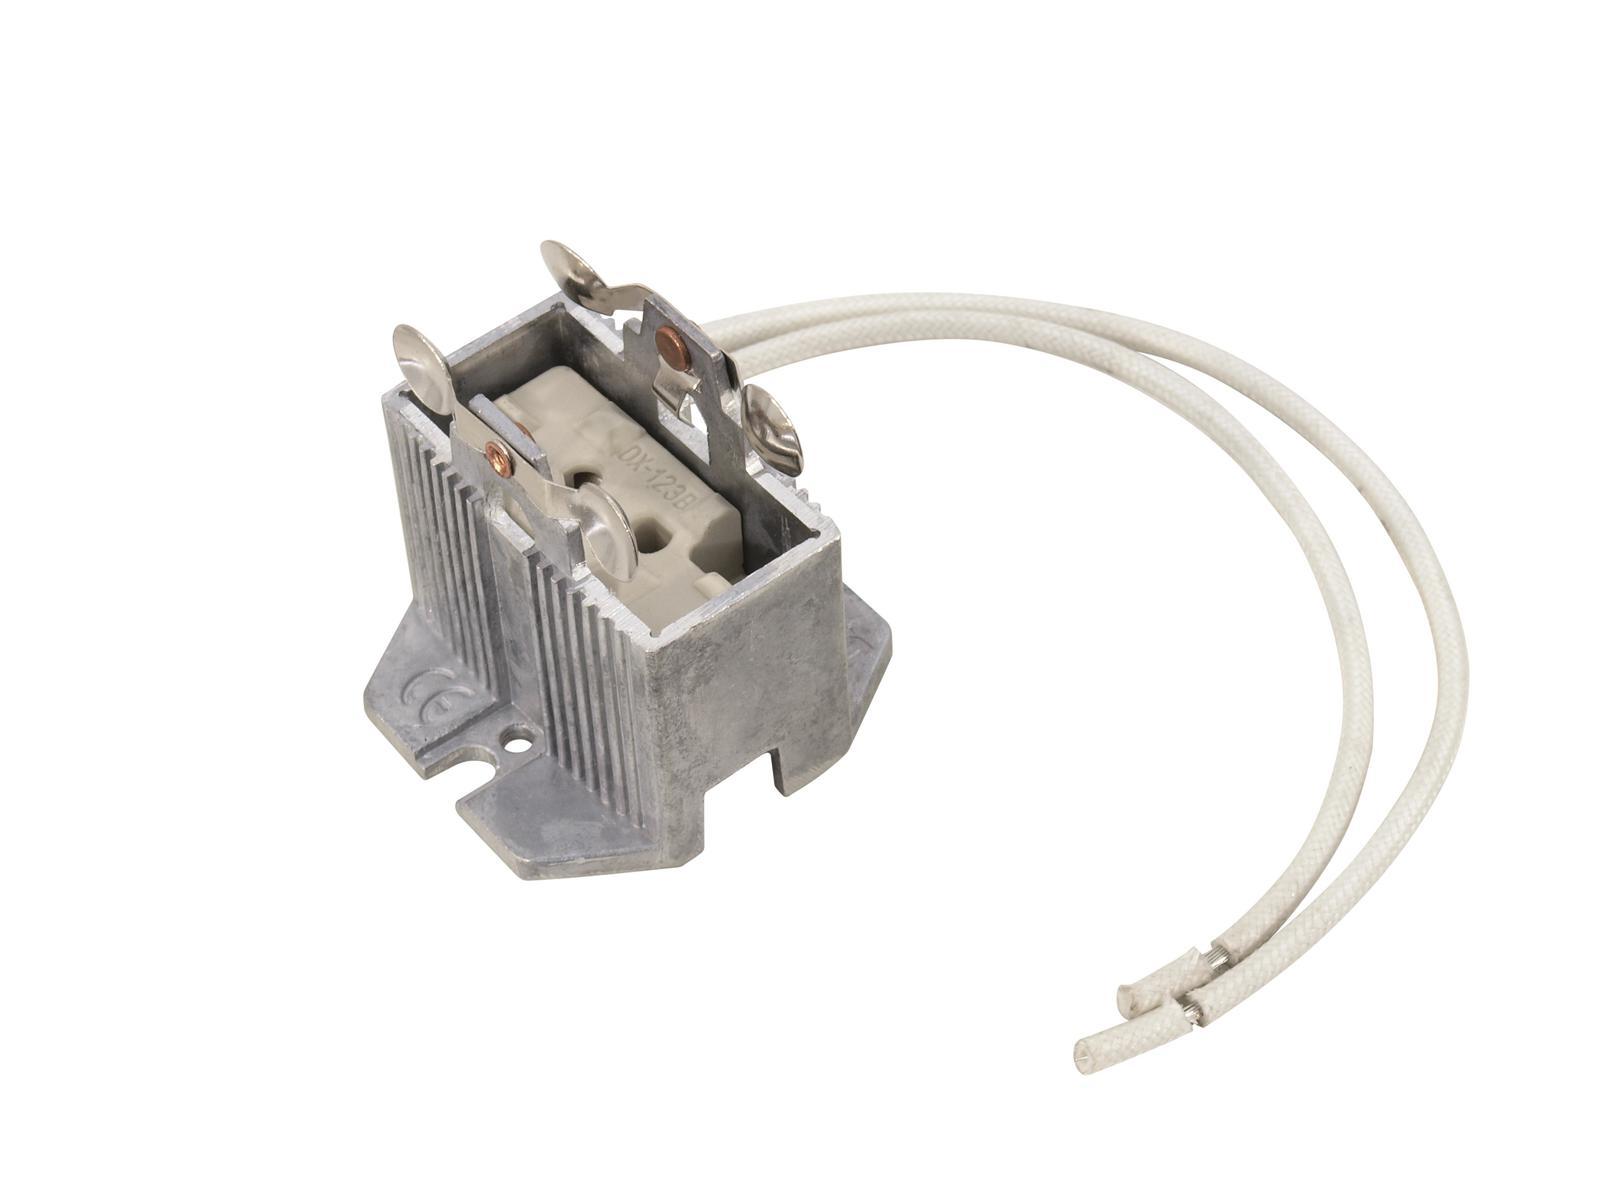 adattatore porta lampada socket GX-9.5  GY-9.5 OMNILUX